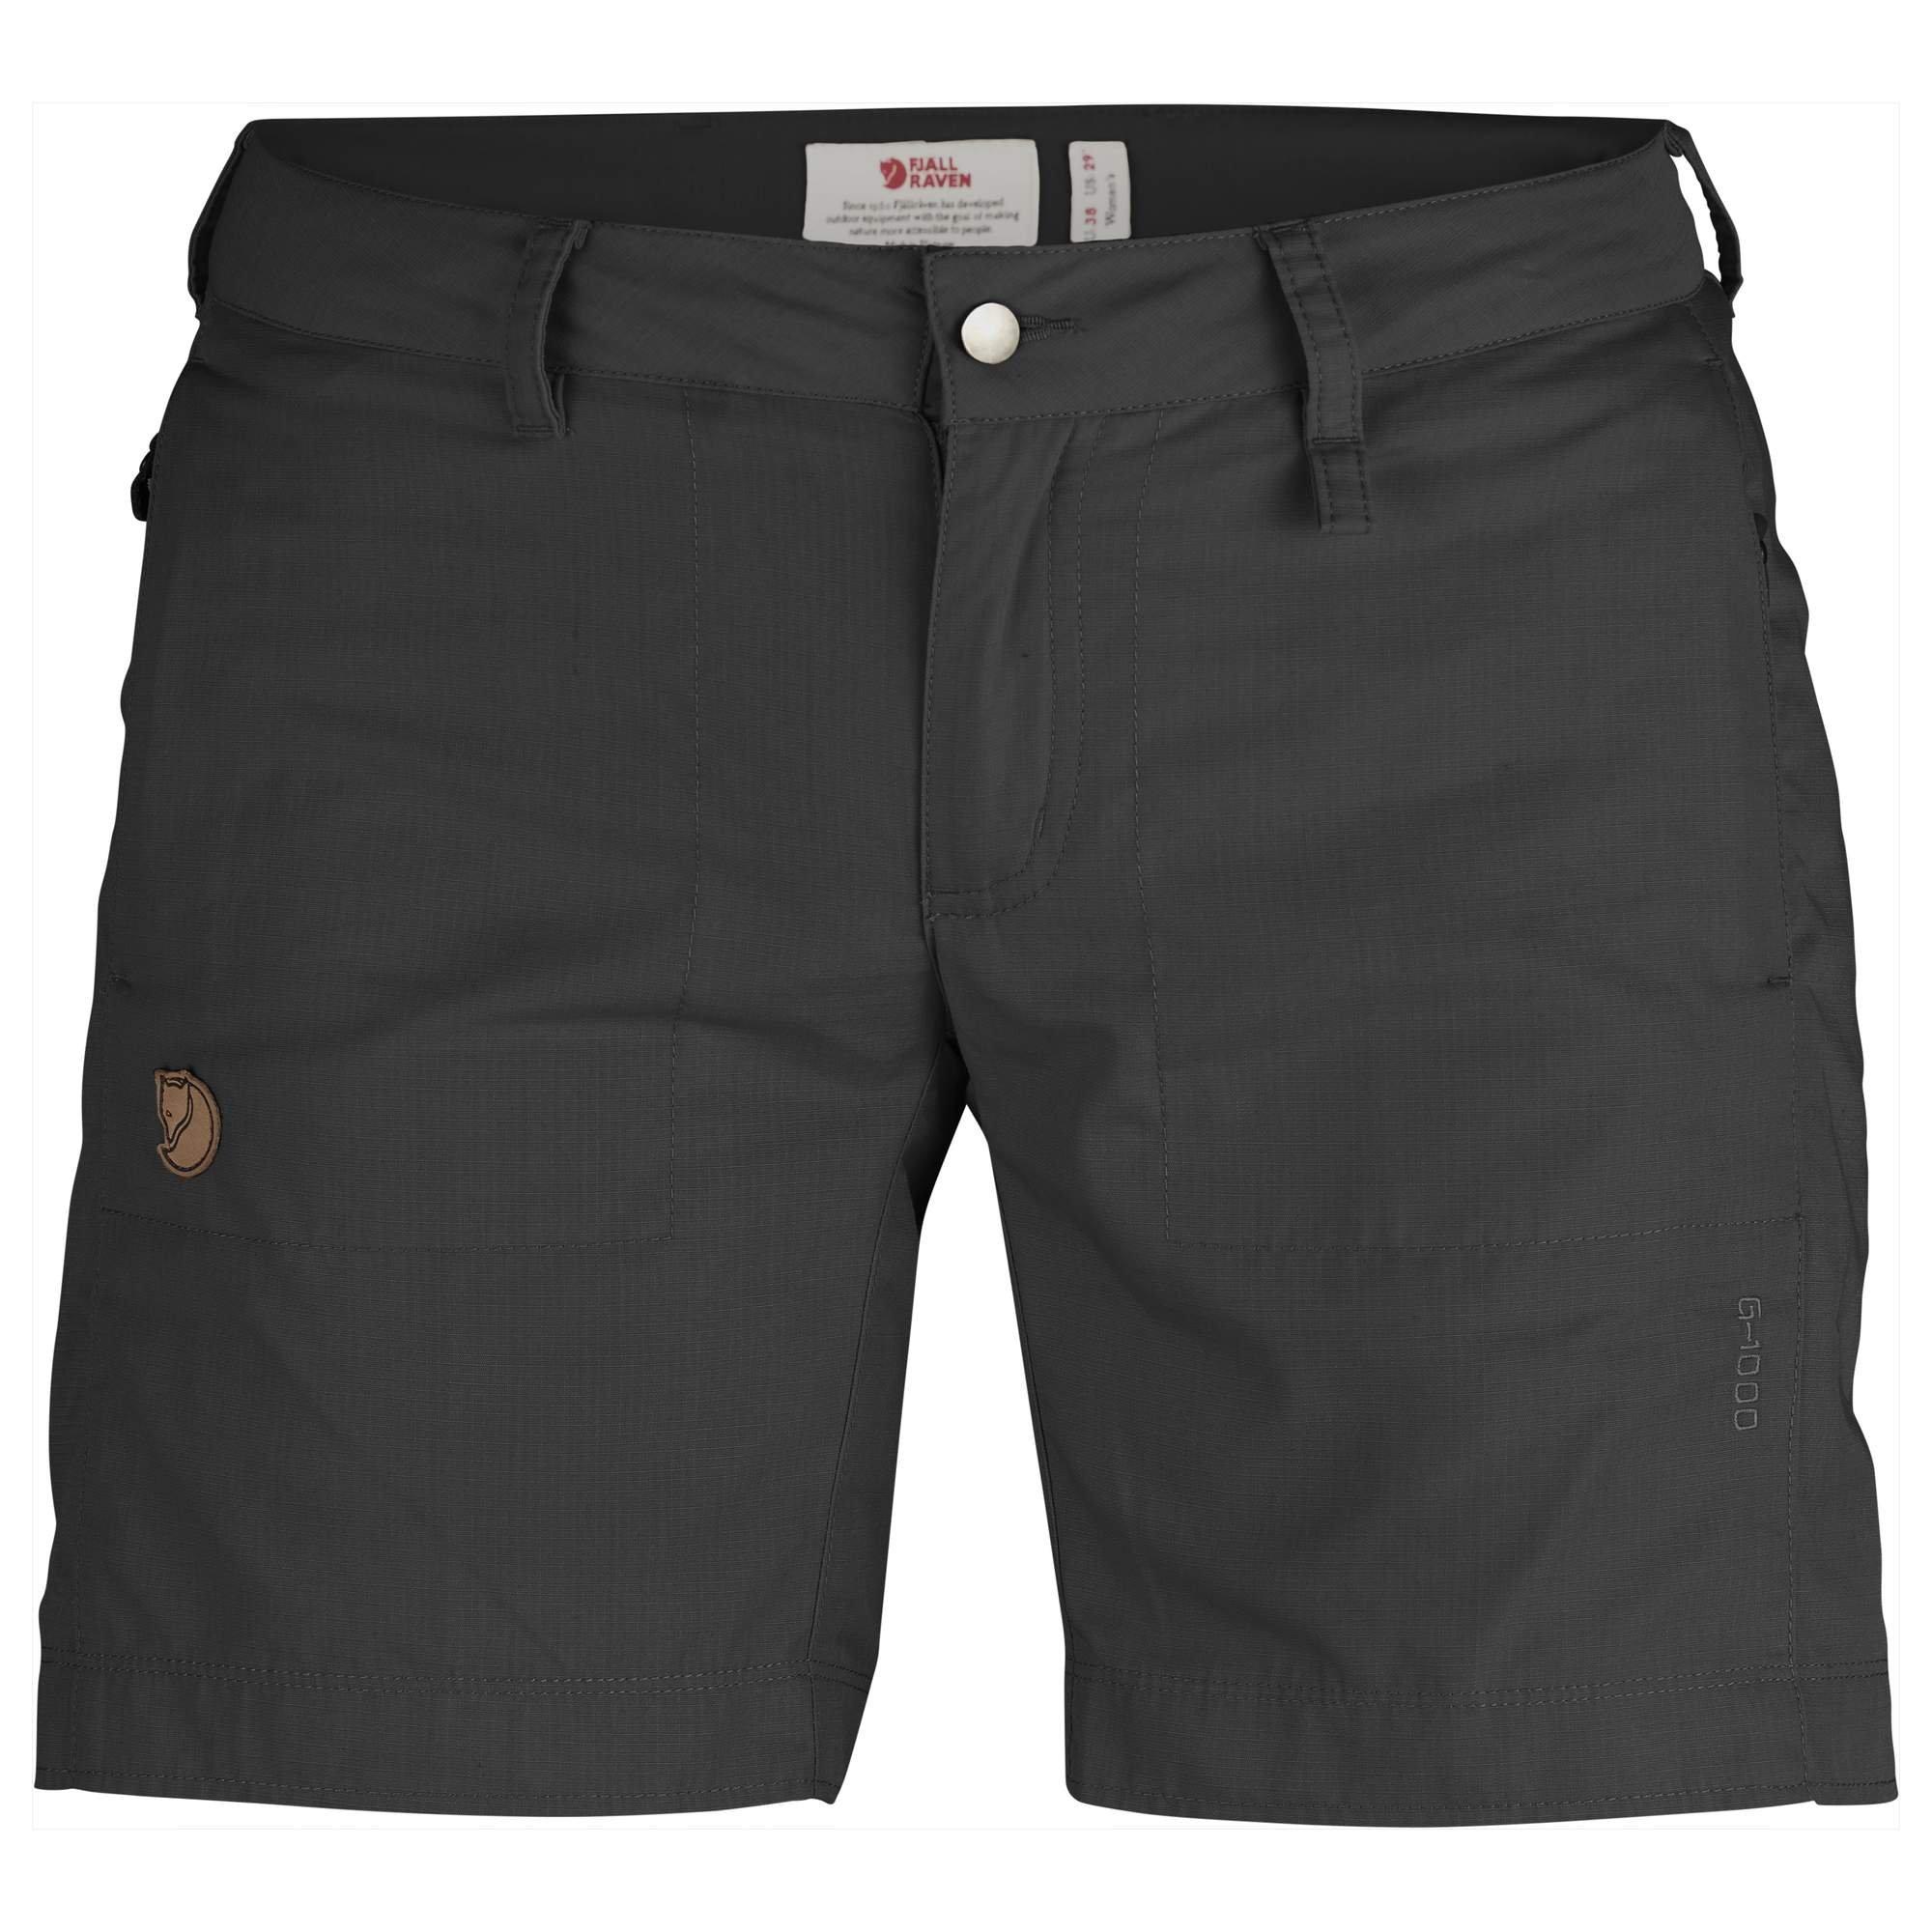 Fjallraven - Women's Abisko Shade Shorts, Dark Grey, 36 by Fjallraven